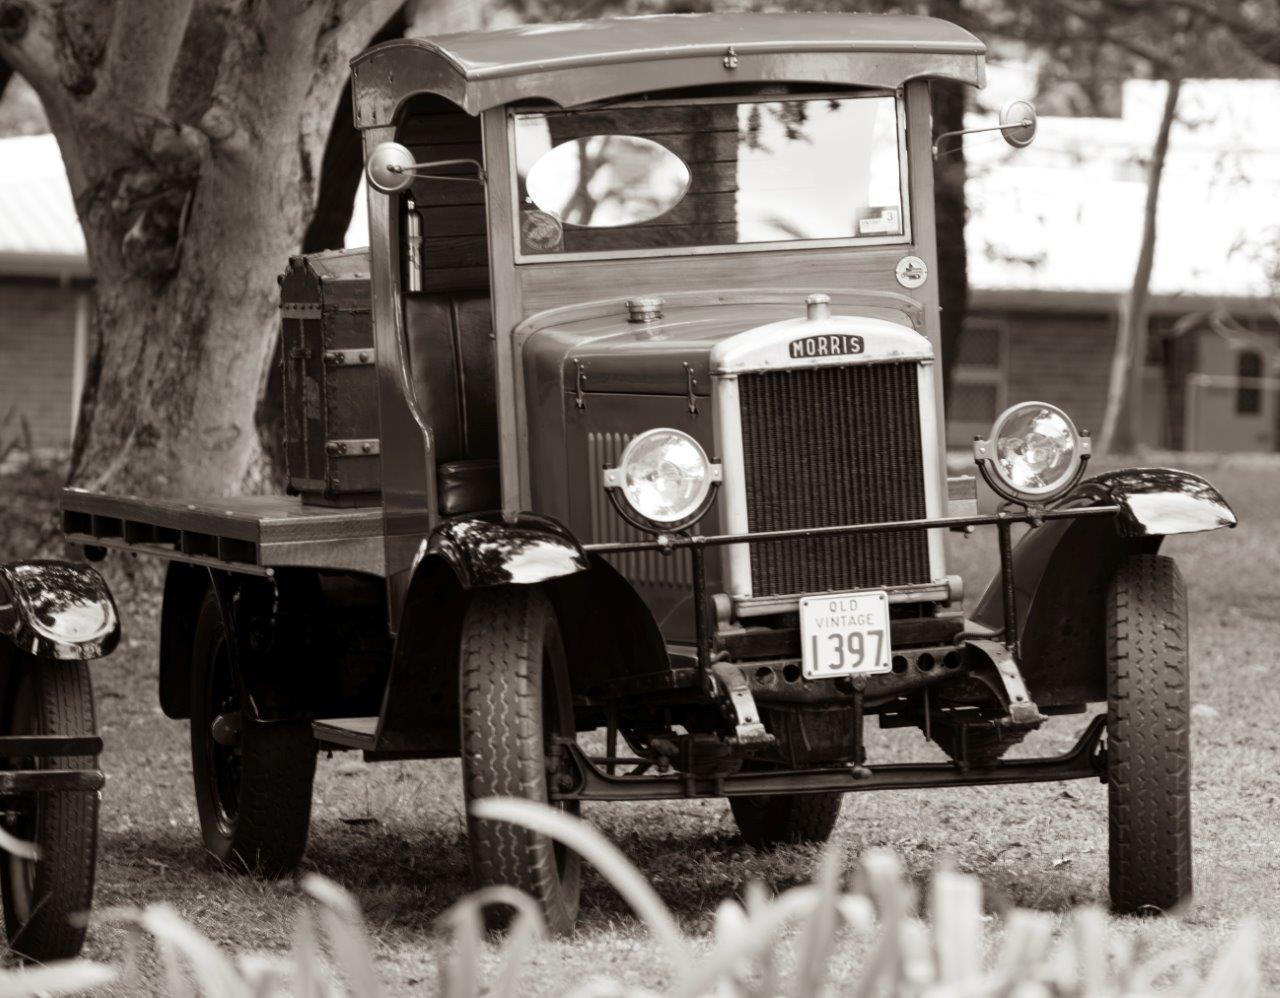 Shady Morris truck